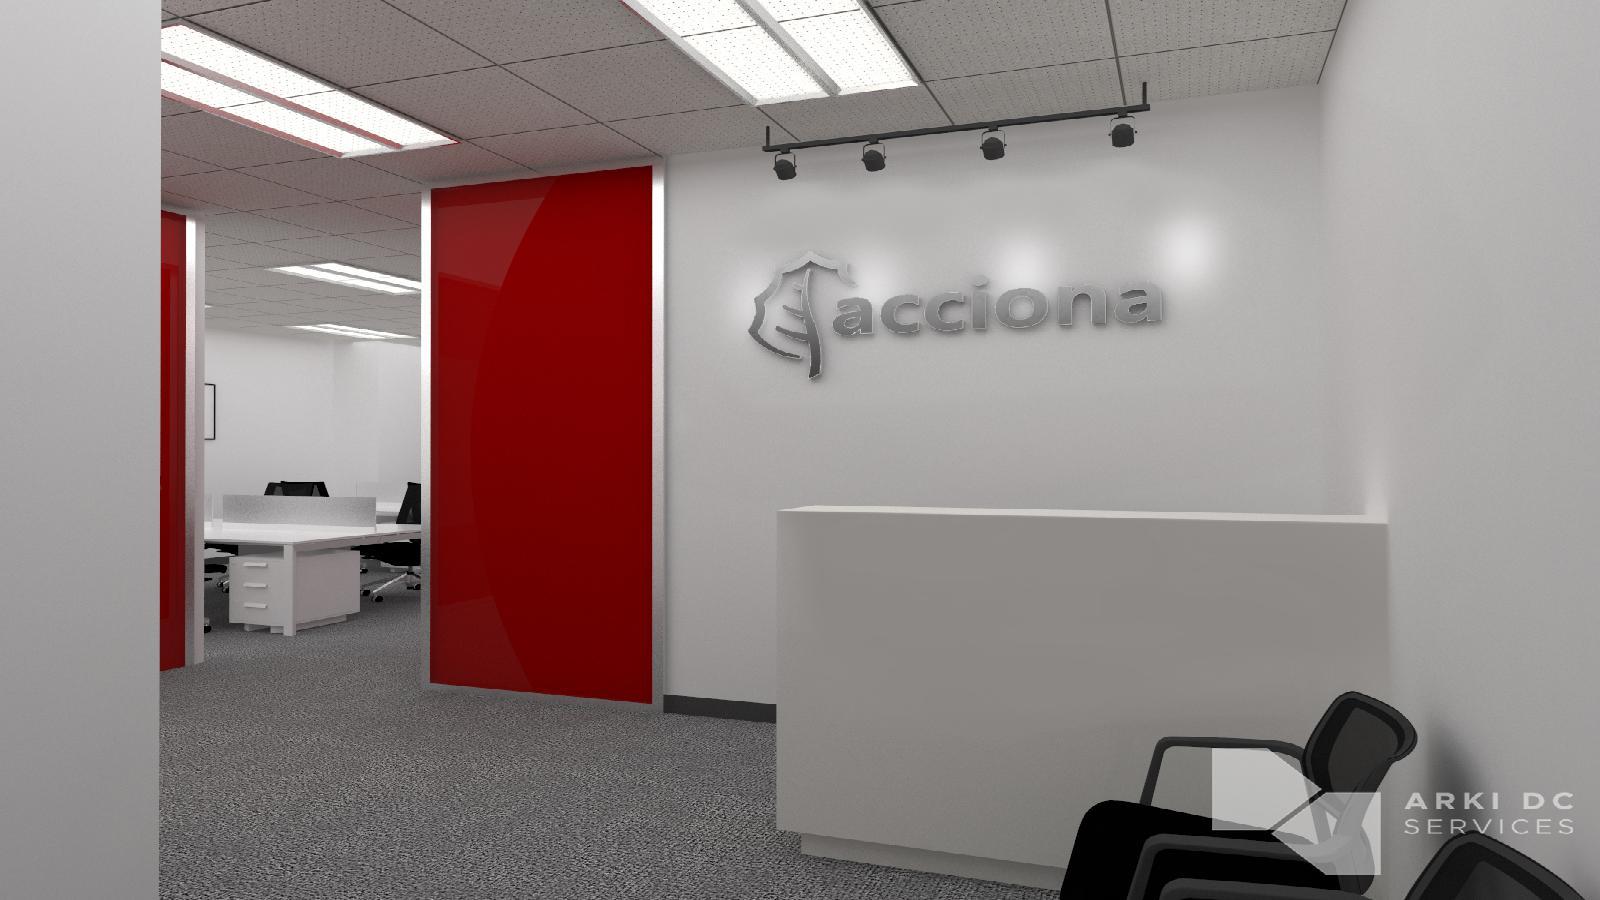 Acciona Construction Philippines Inc